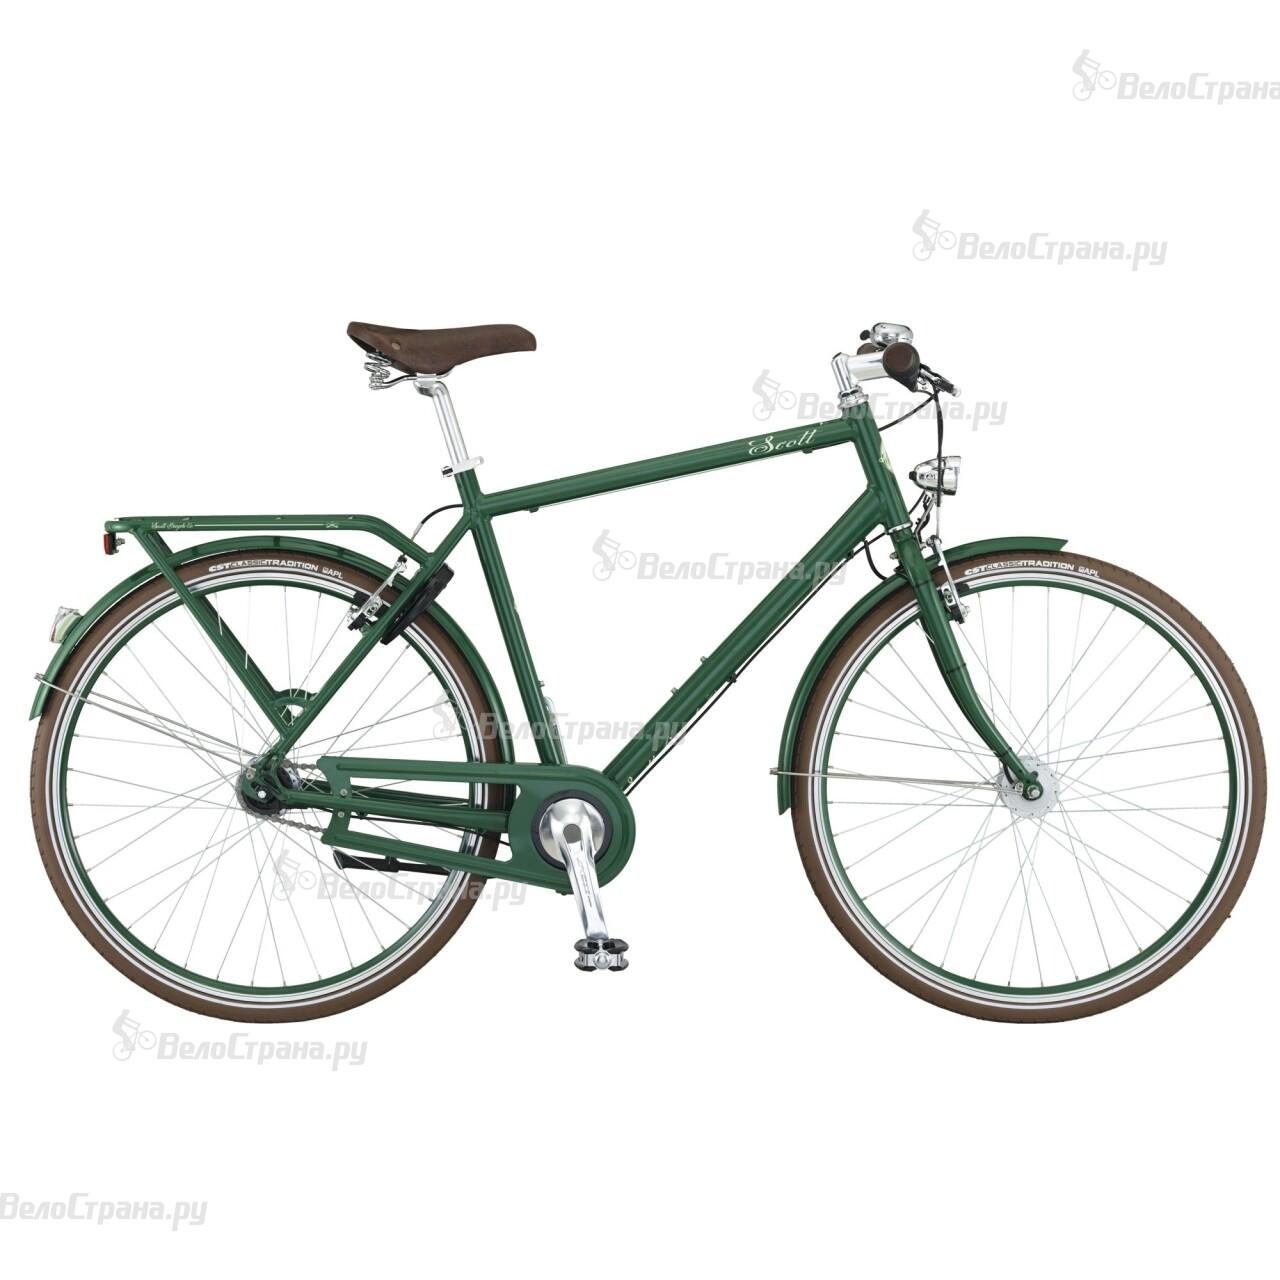 Велосипед Scott Sub Retro Men (2015) велосипед scott sub cross 30 men 2017